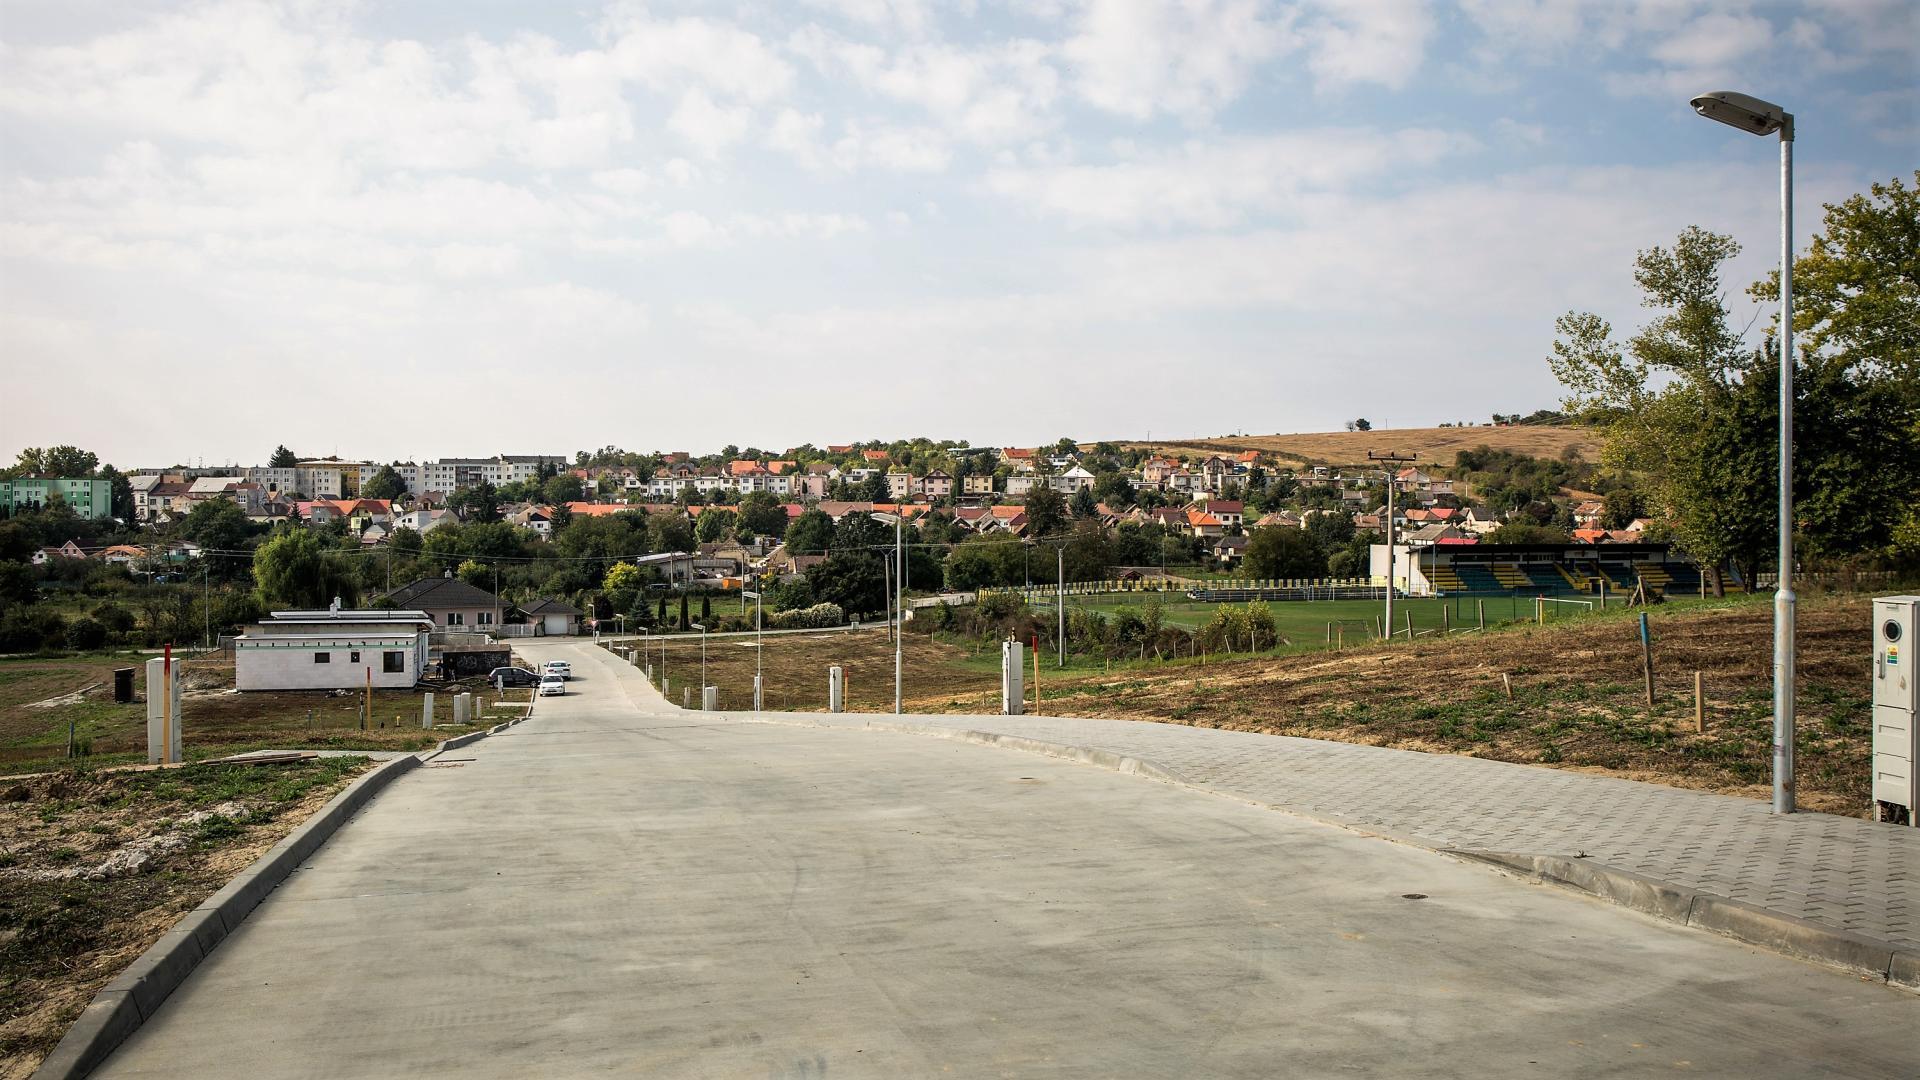 Stavebný pozemok č. 6 a 21 v zelenom prostredí